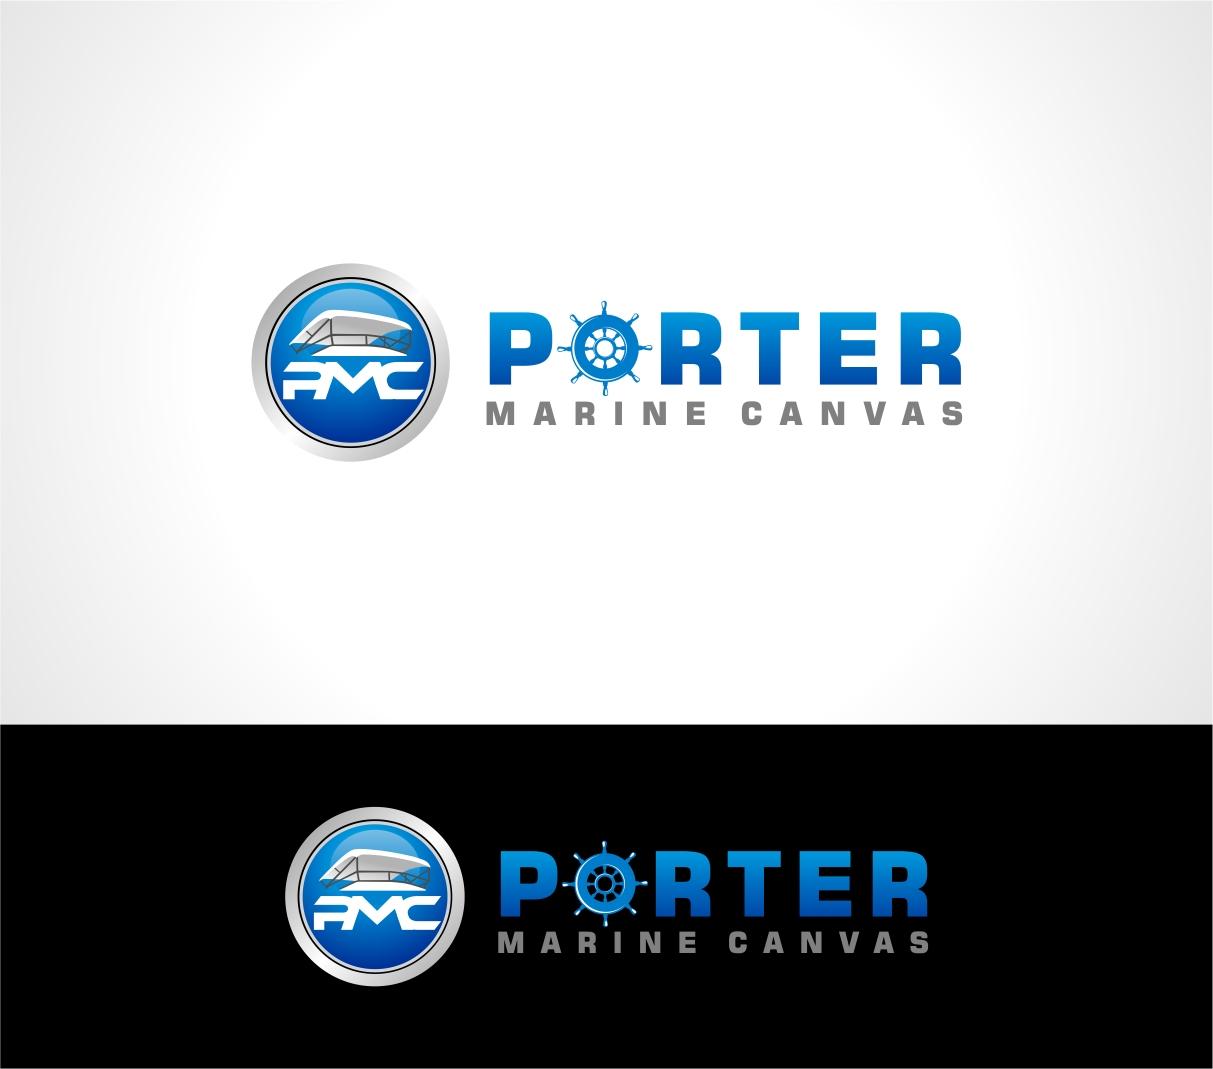 Logo Design by haidu - Entry No. 105 in the Logo Design Contest Imaginative Logo Design for Porter Marine Canvas.